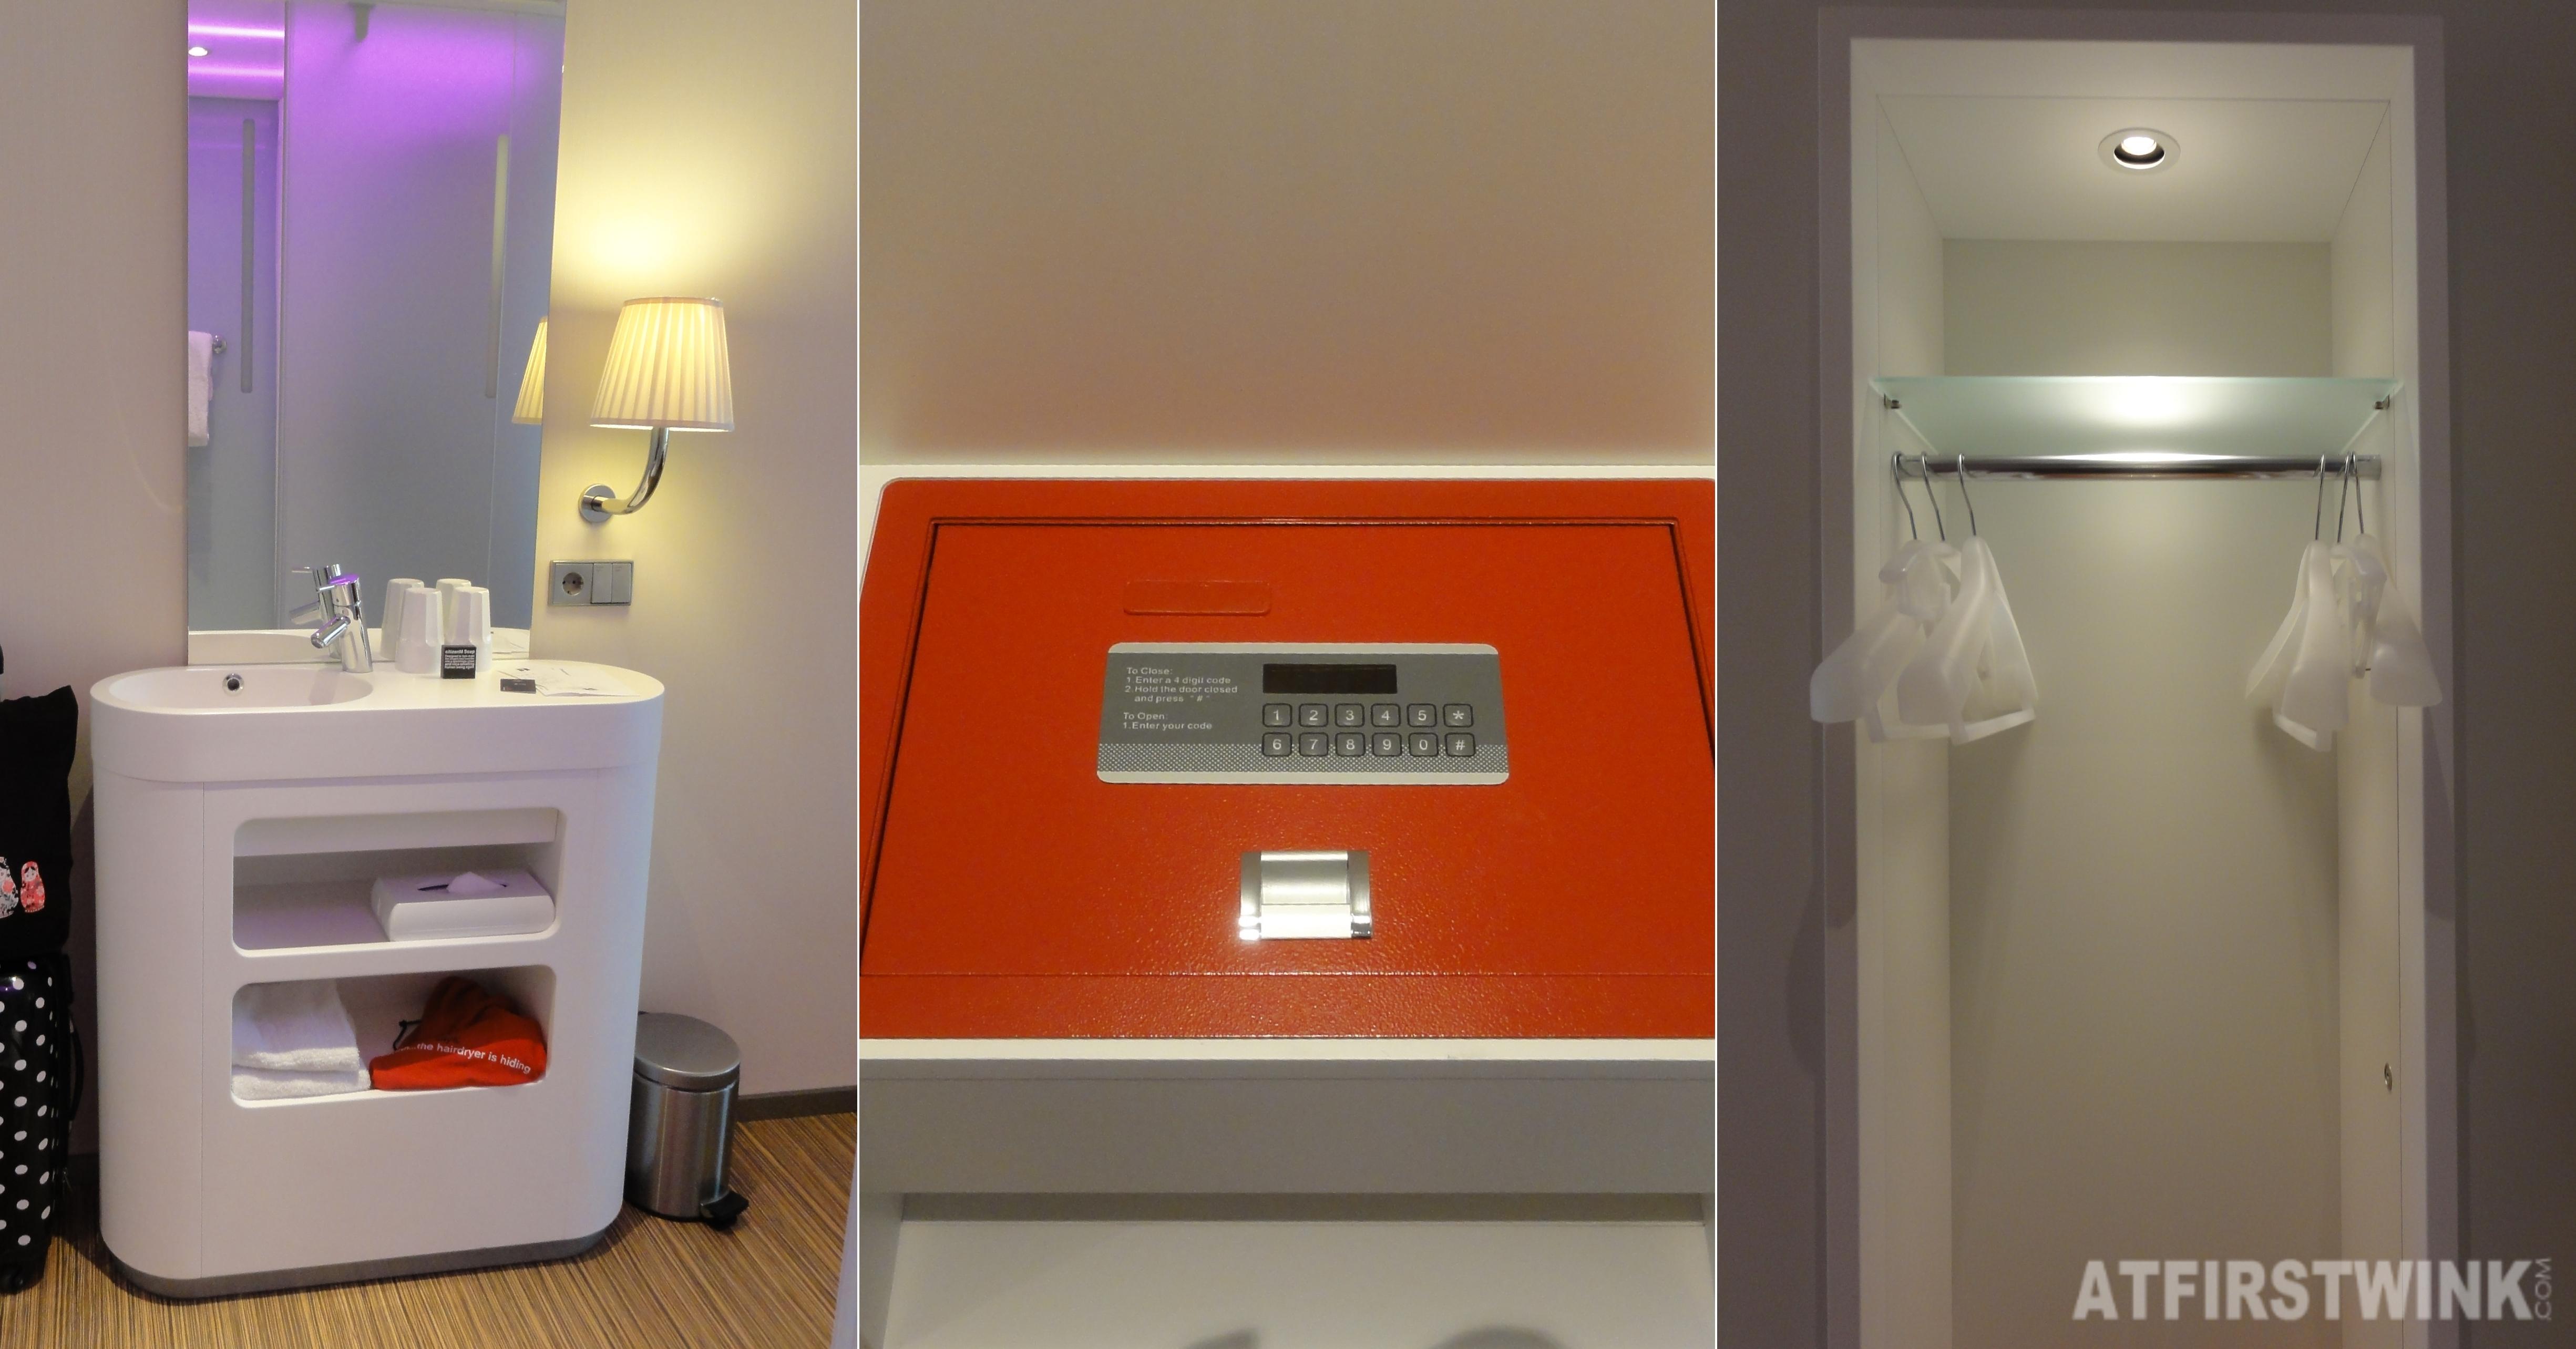 citizenM hotel in Rotterdam sink safe closet